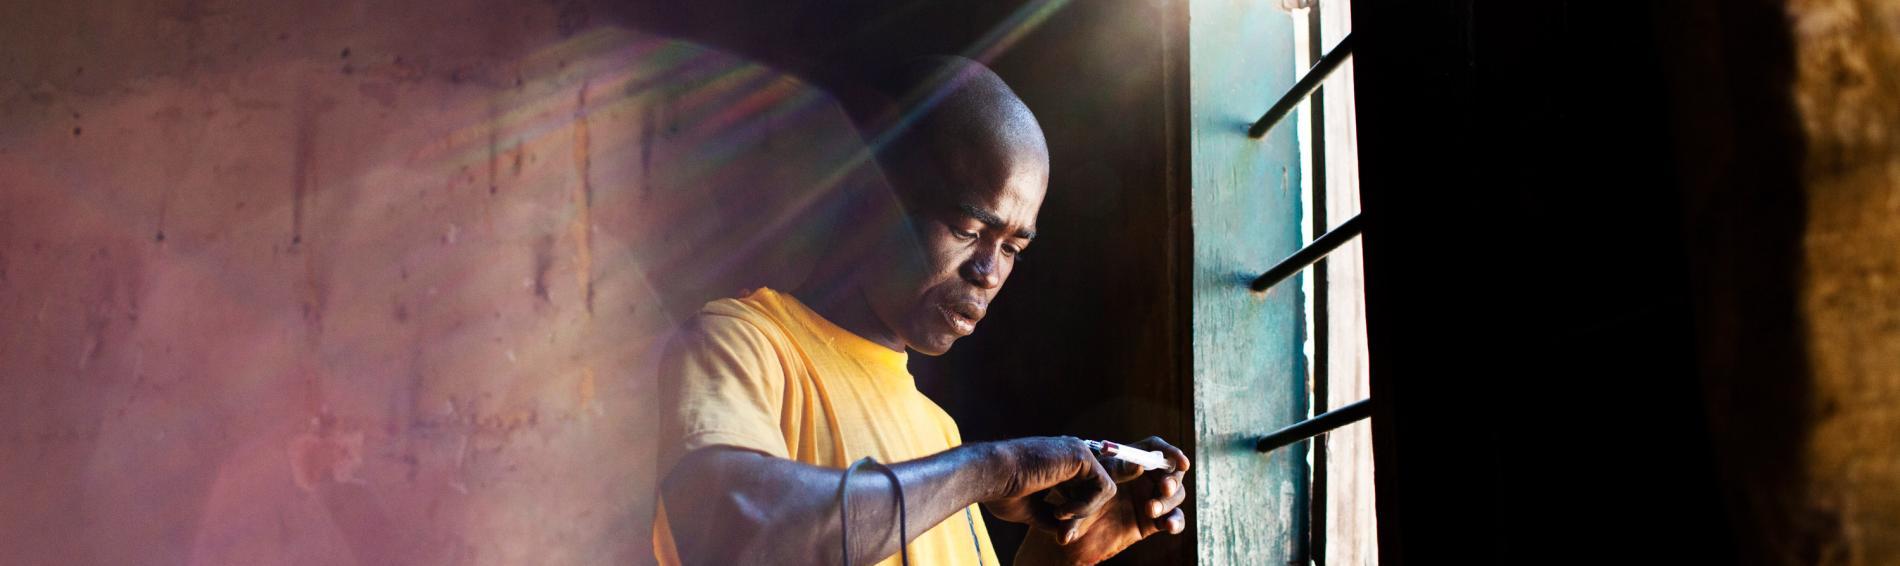 Ein Drogenabhängiger in Dar es Salaam. Foto: William Daniels